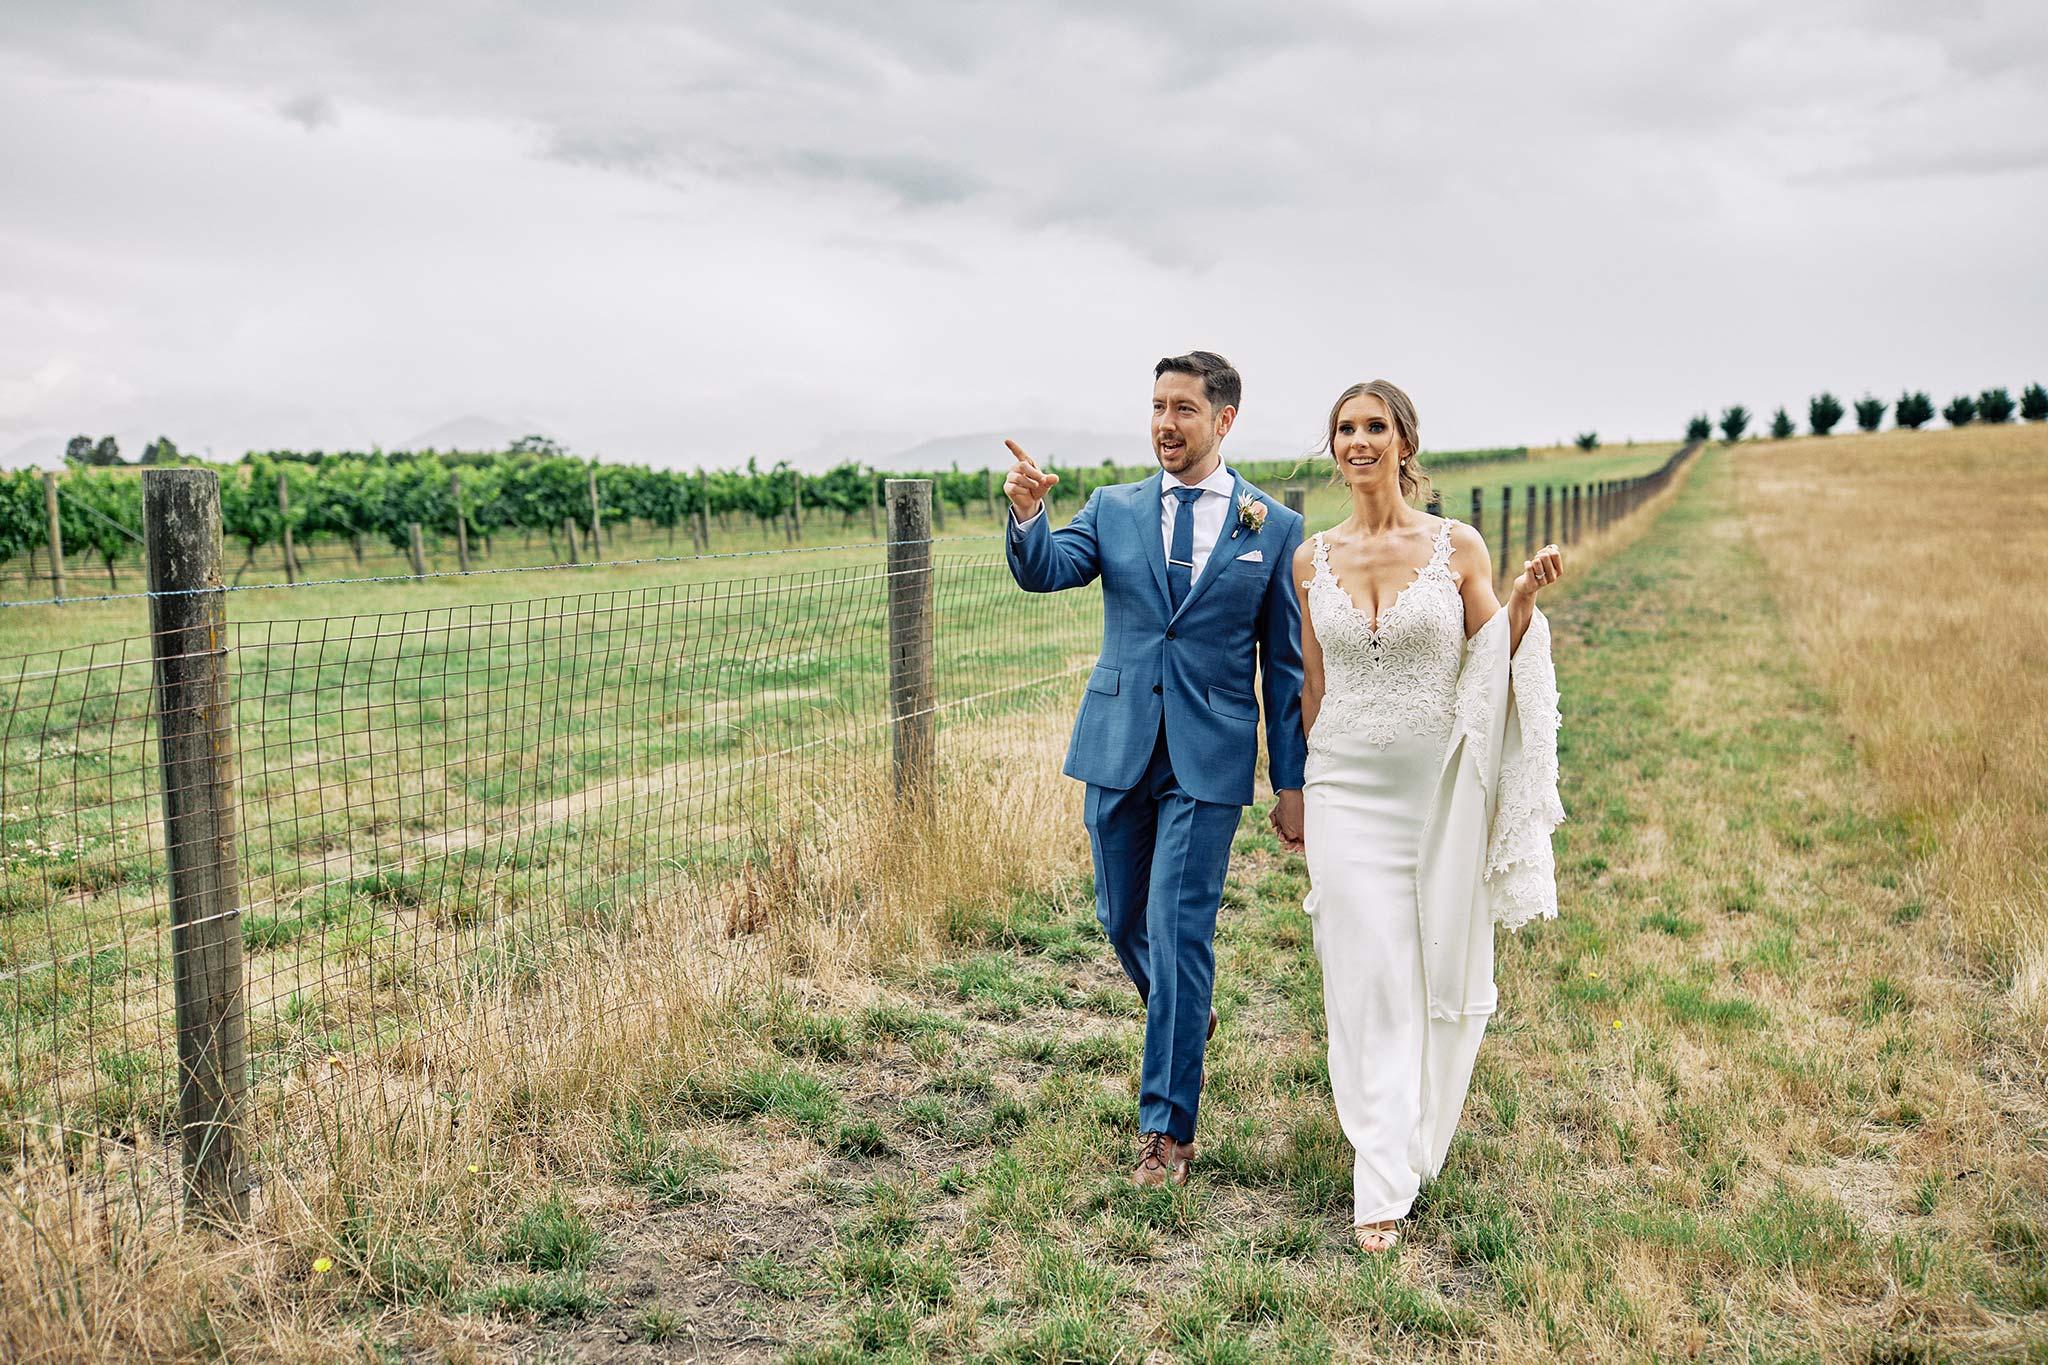 Zonzo estate wedding couple walking back